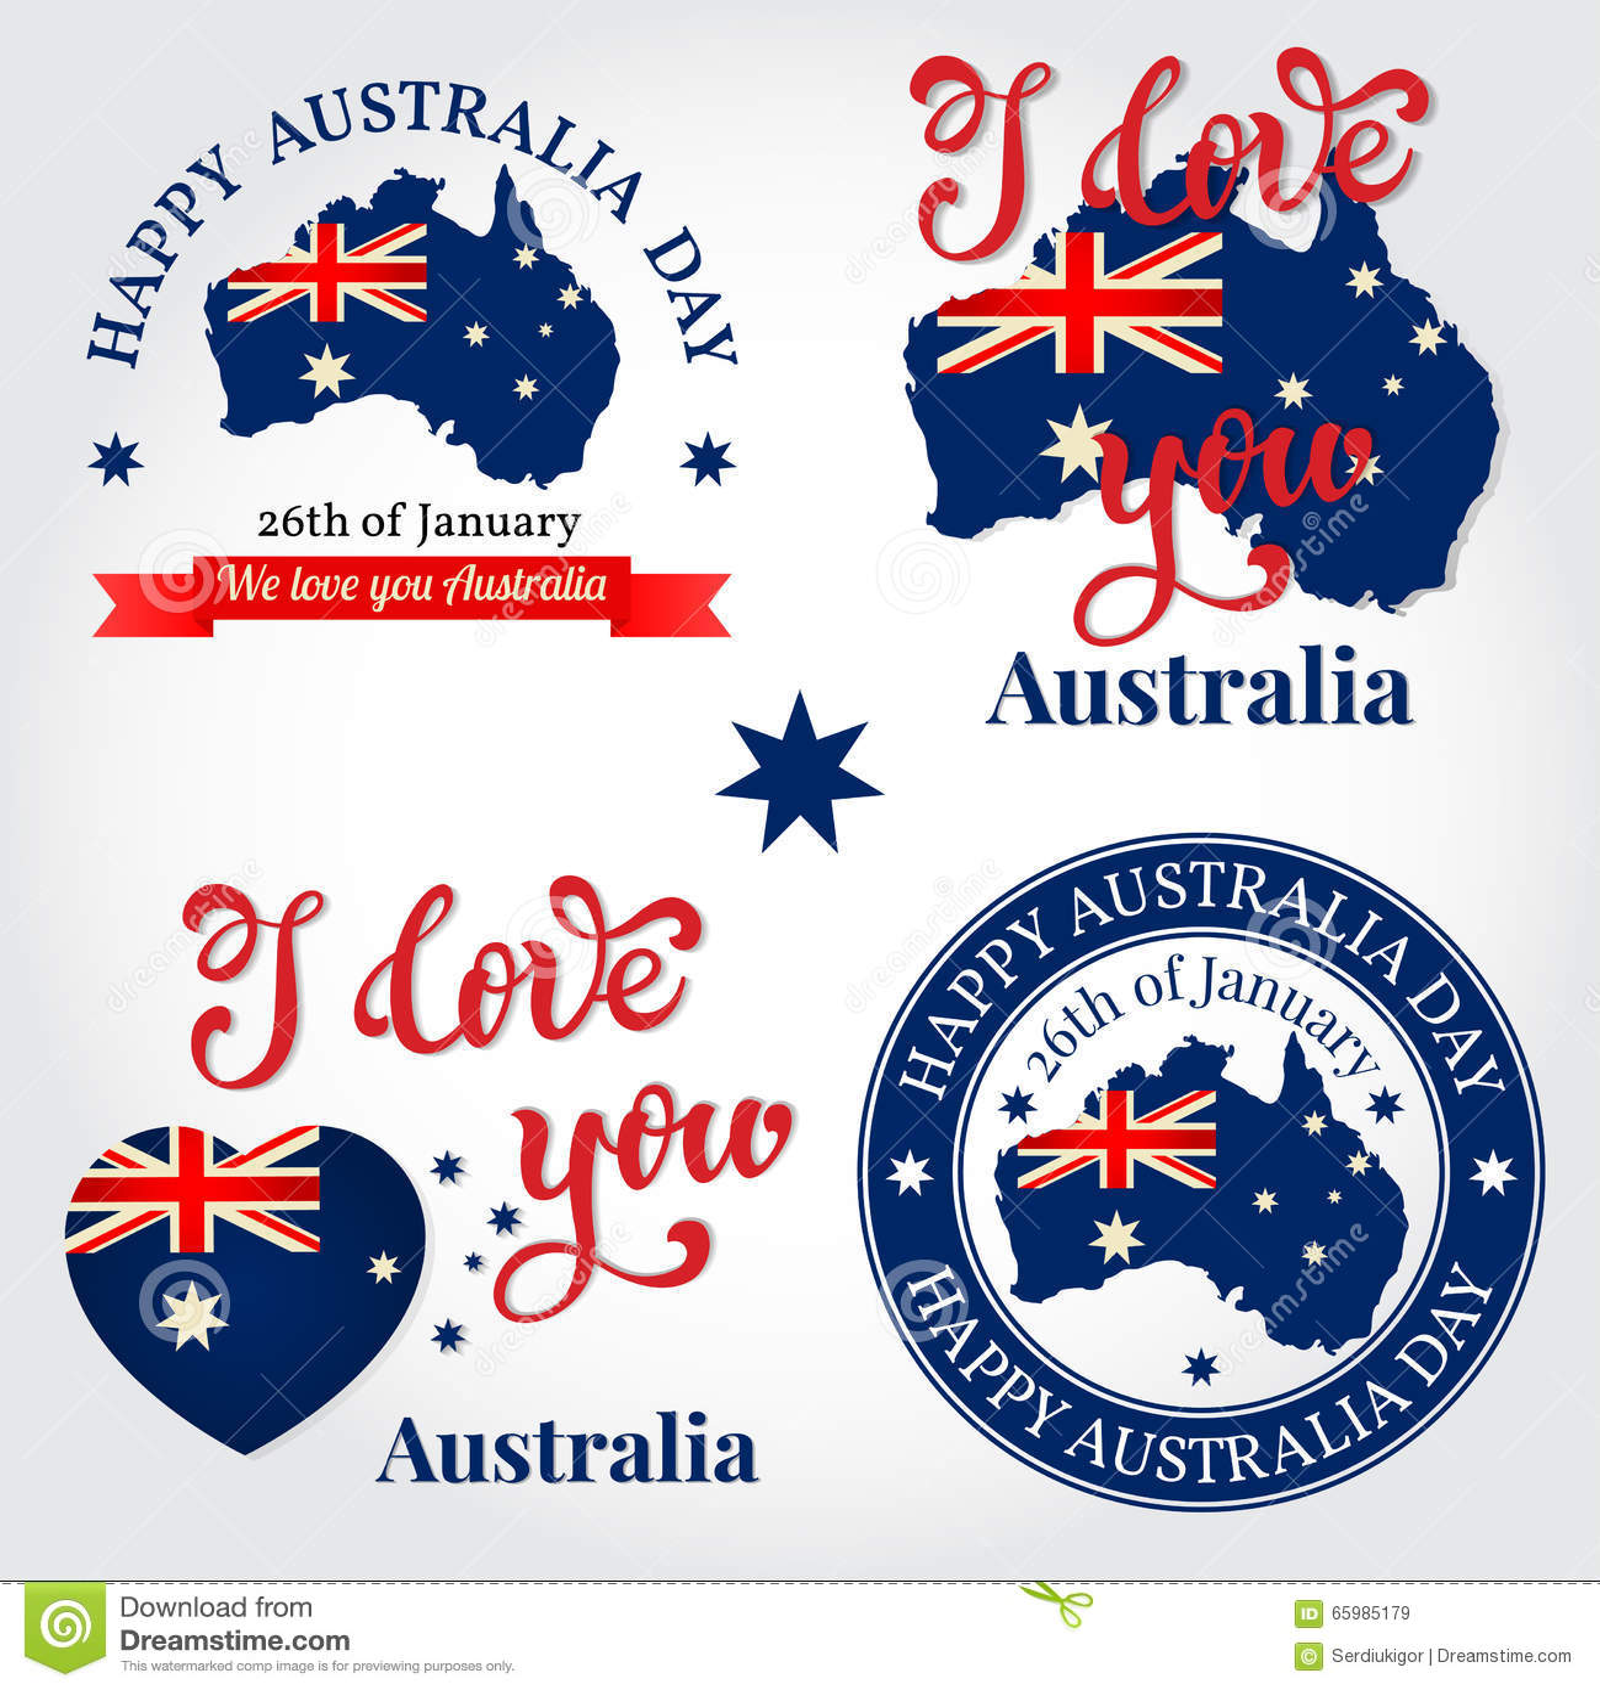 Will you date me in Australia